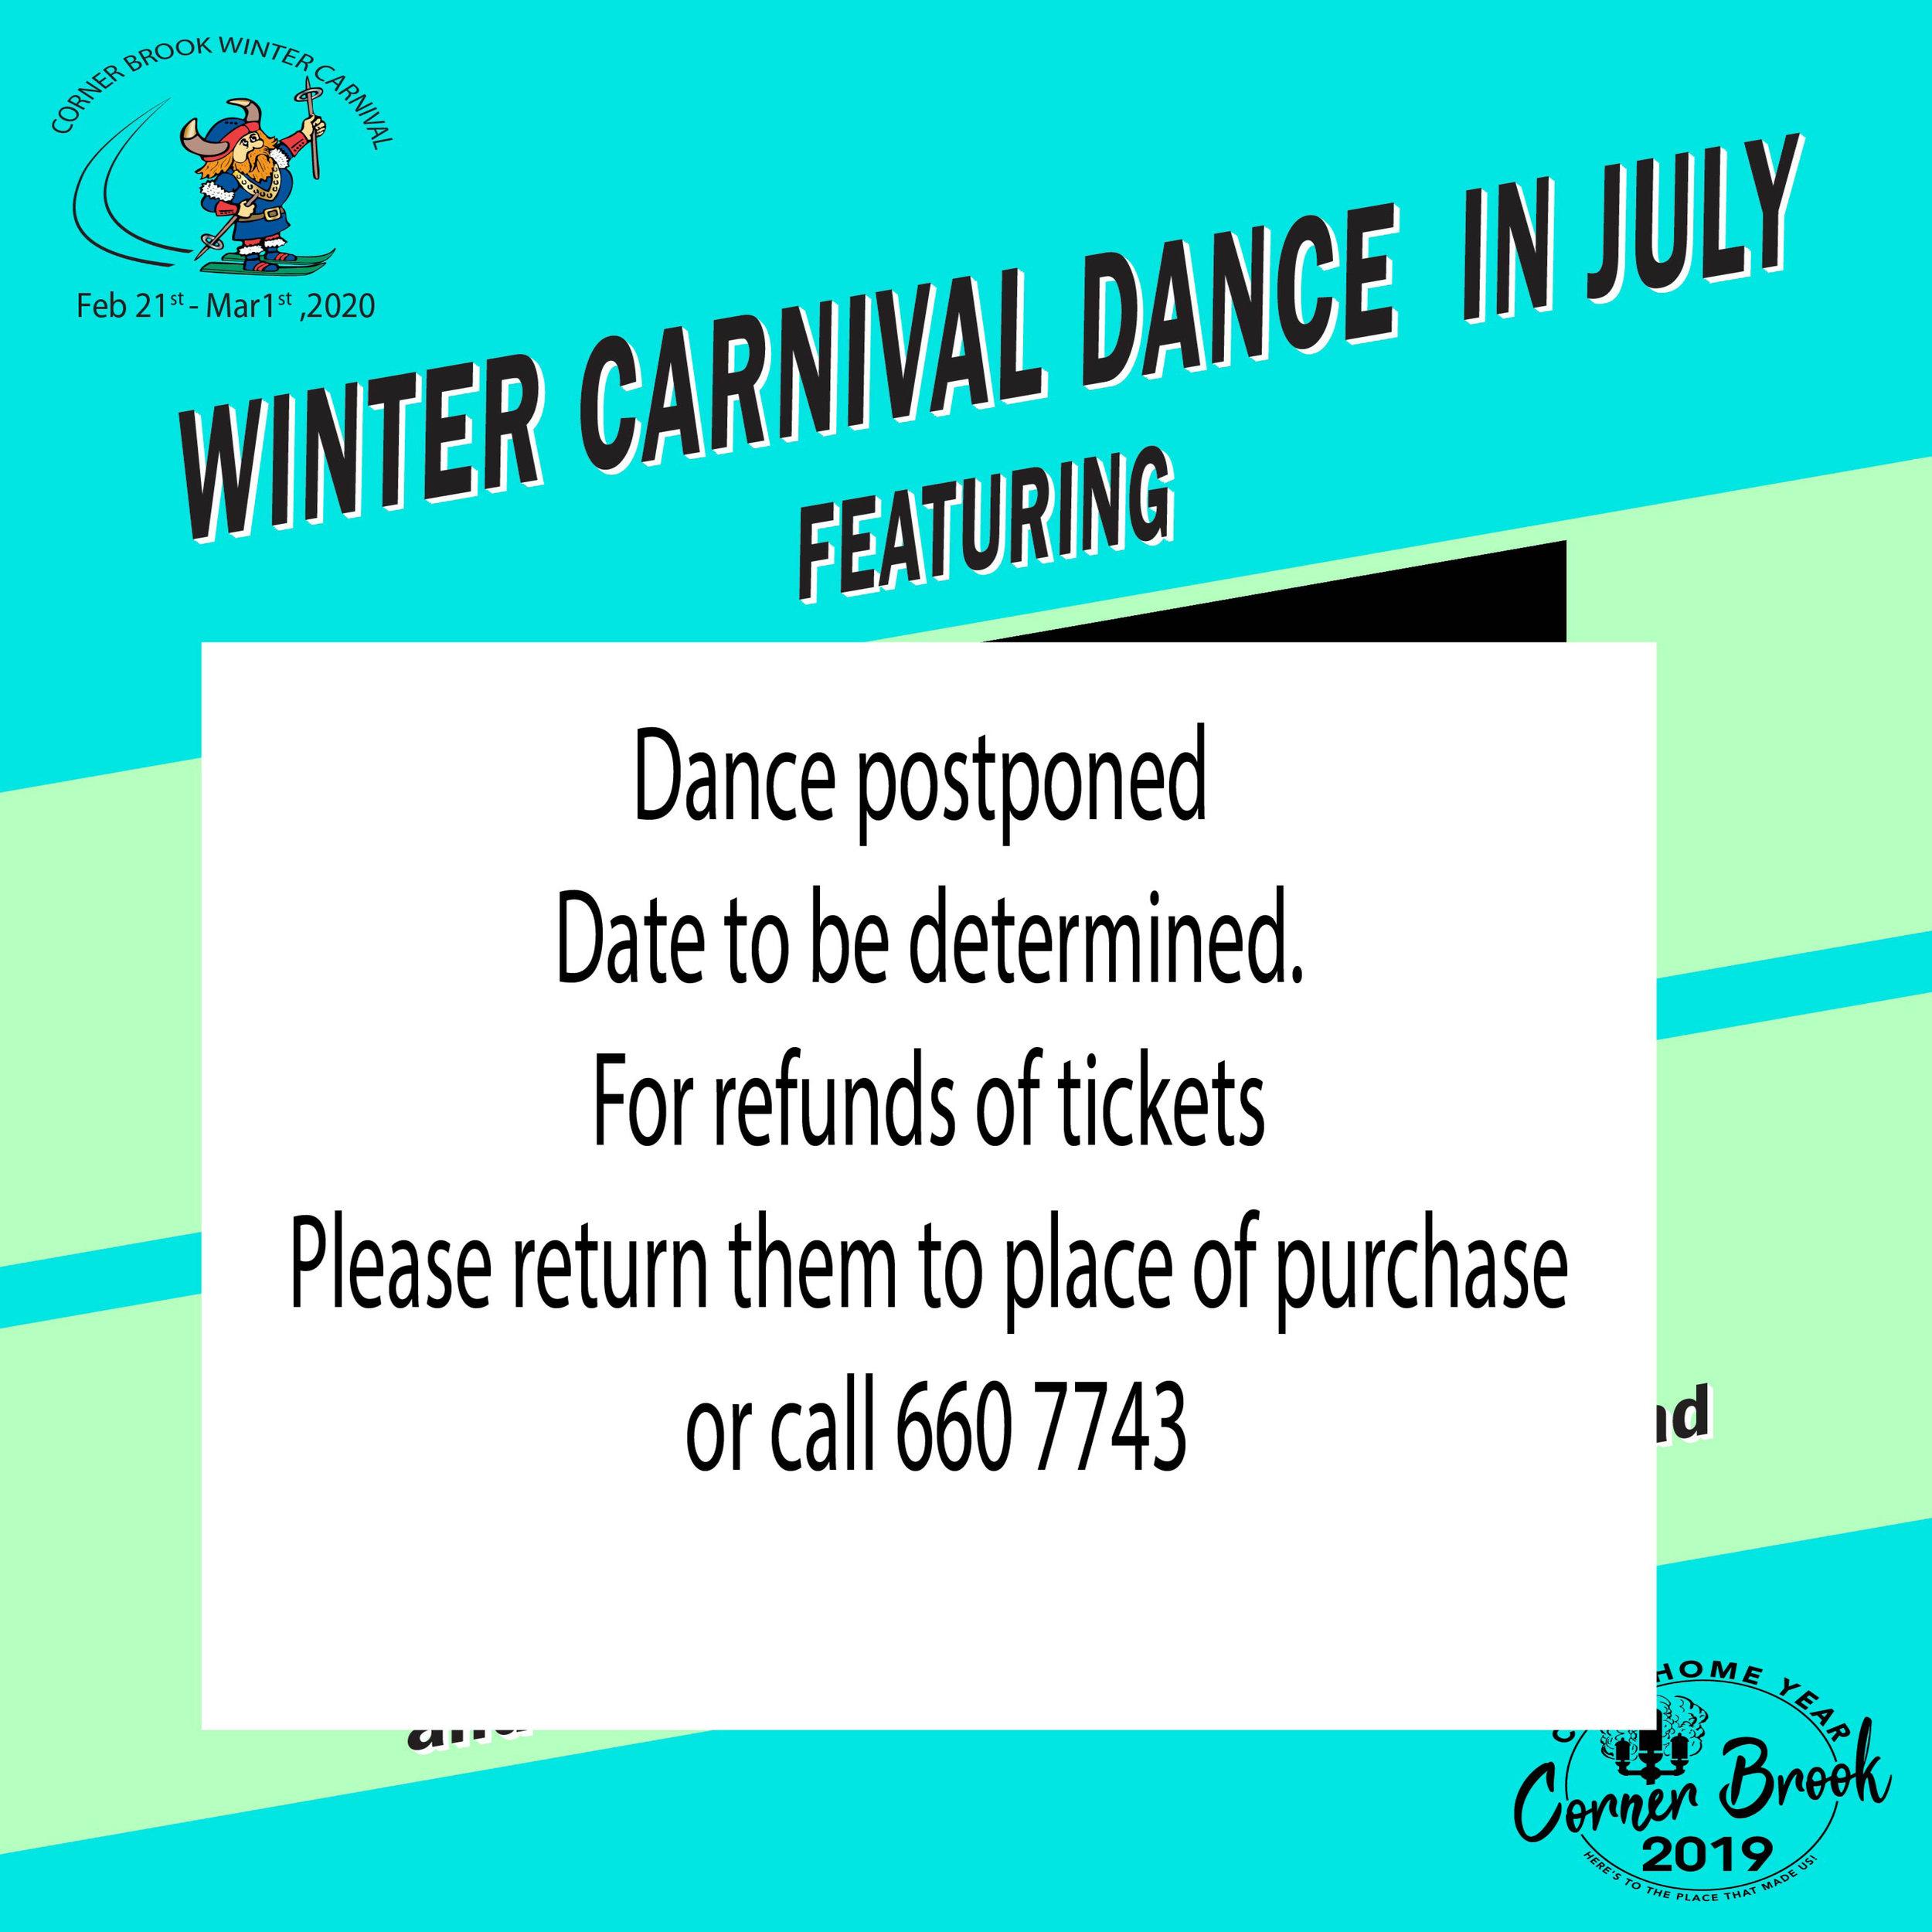 Carnival Dance Postponed Instagram.jpg